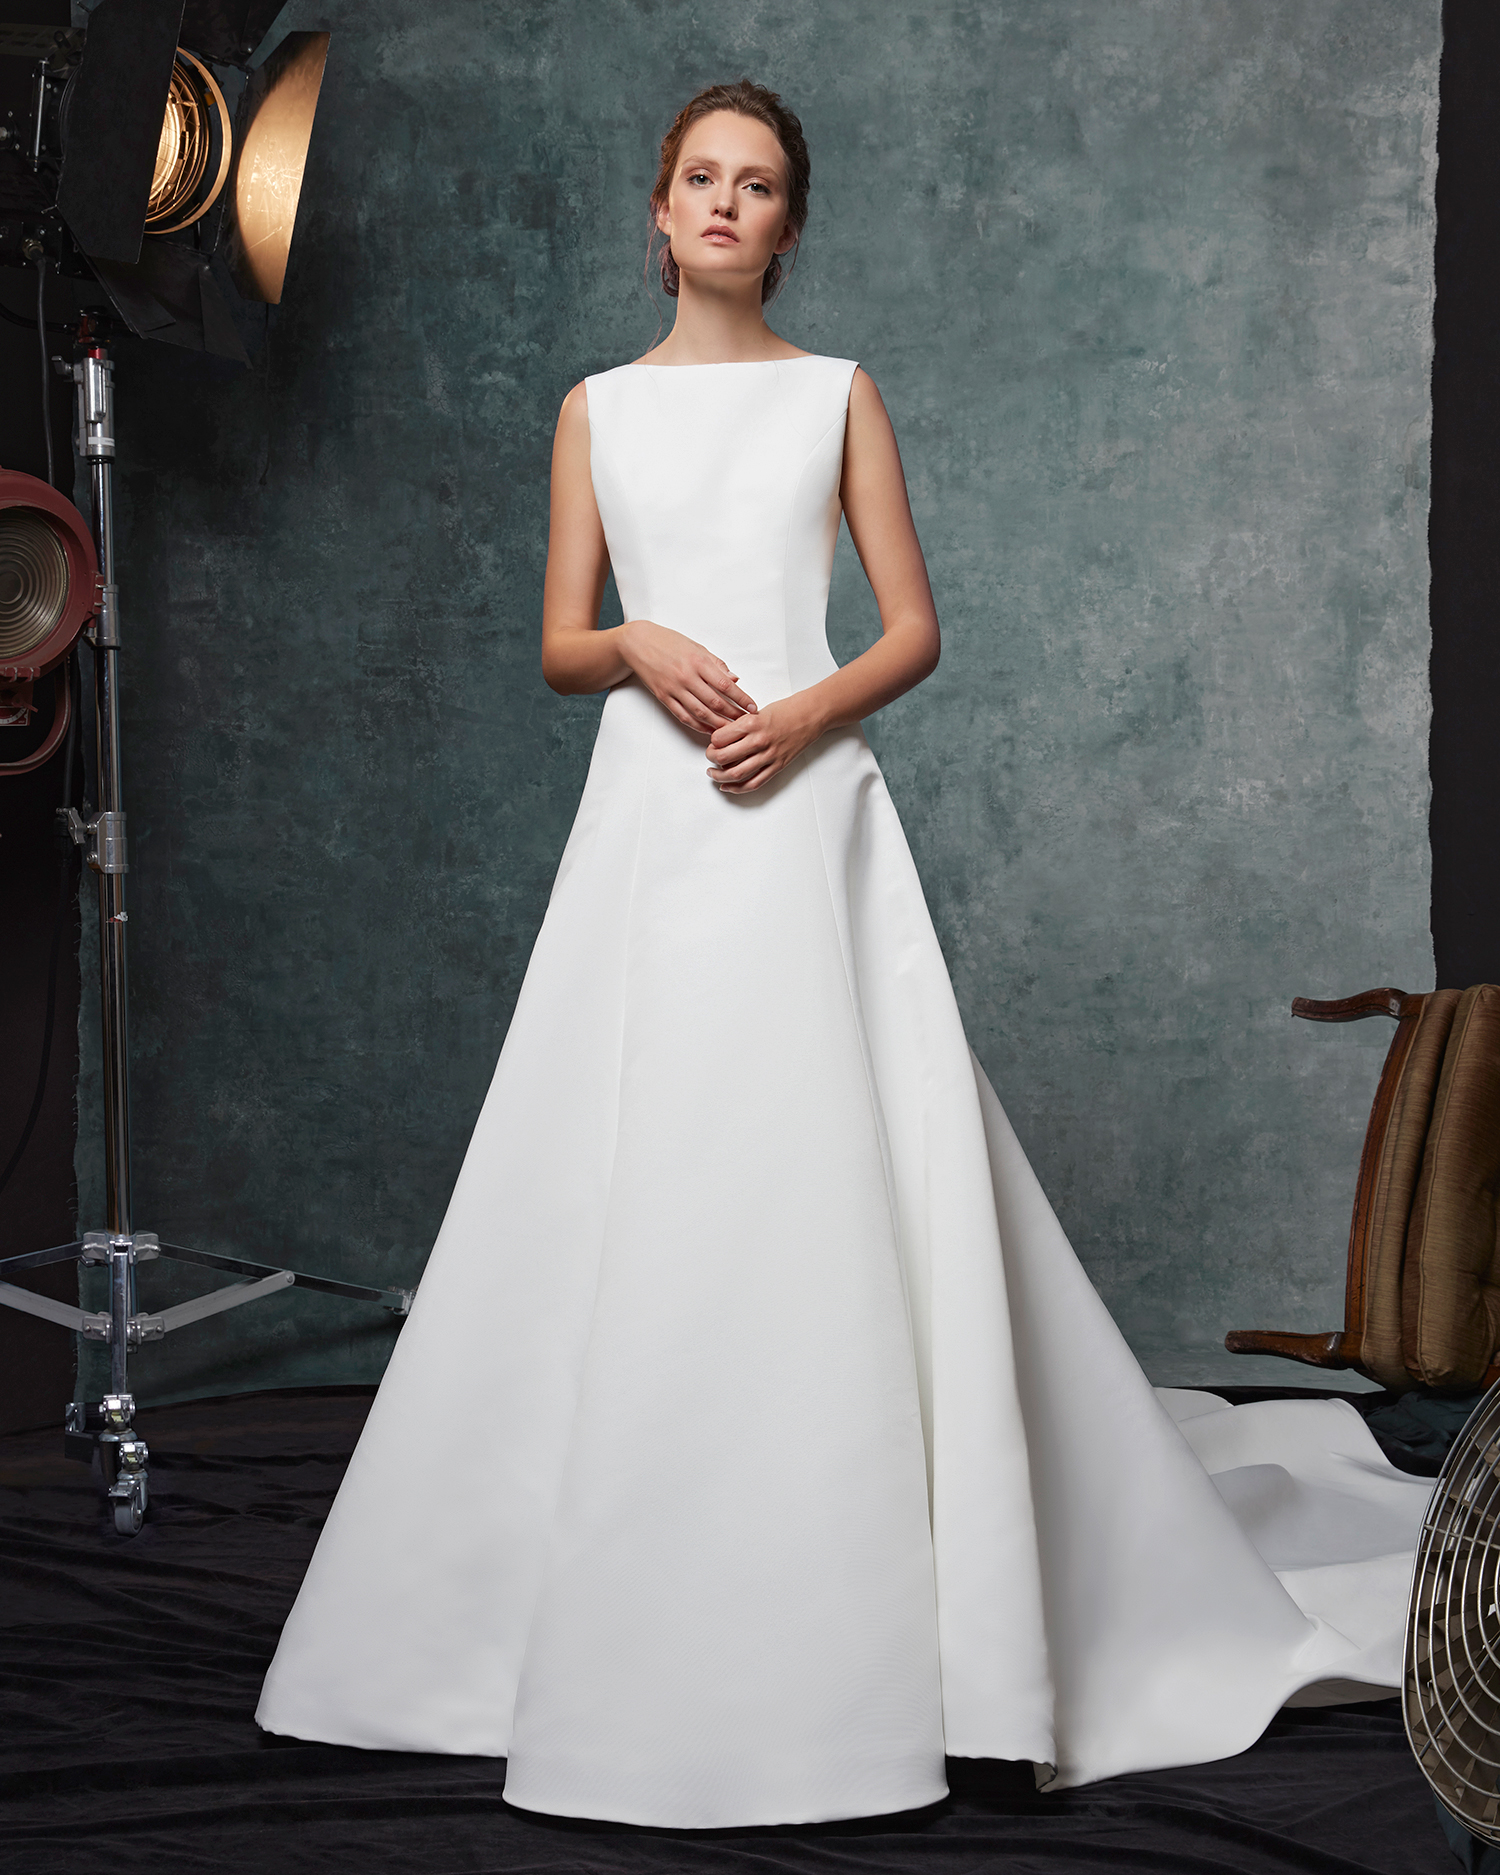 sareh nouri dress fall 2019 minimal boat neck a-line